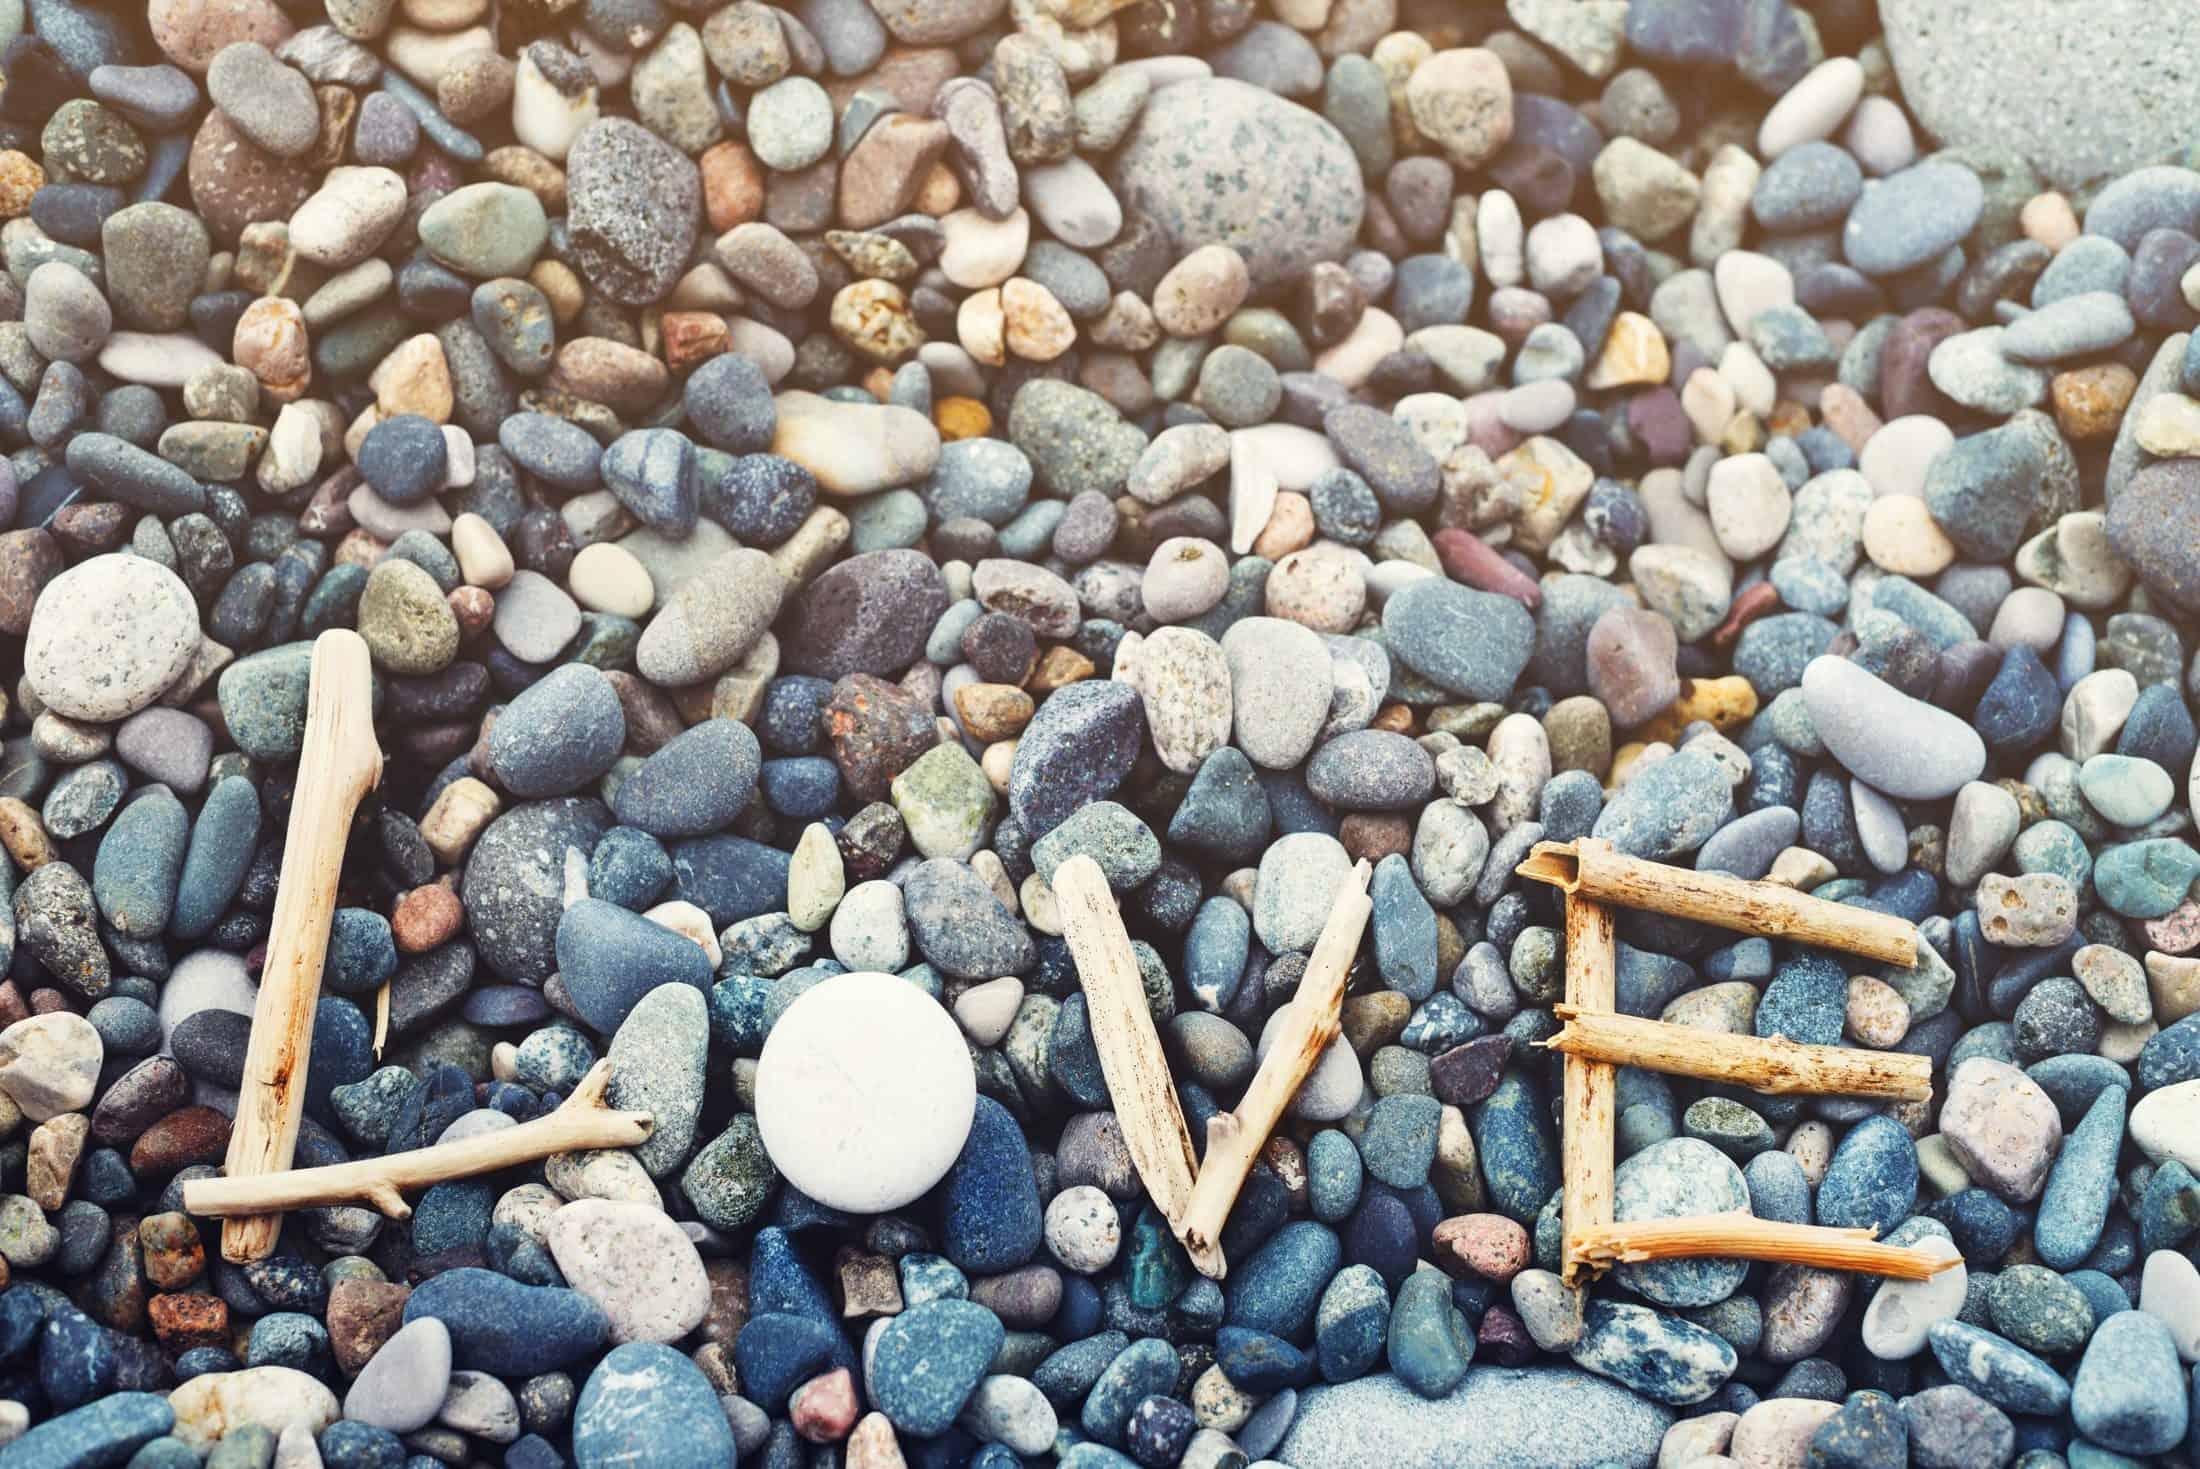 Sticks And Stones May Break My Bones…But…Kind Words Create Trust